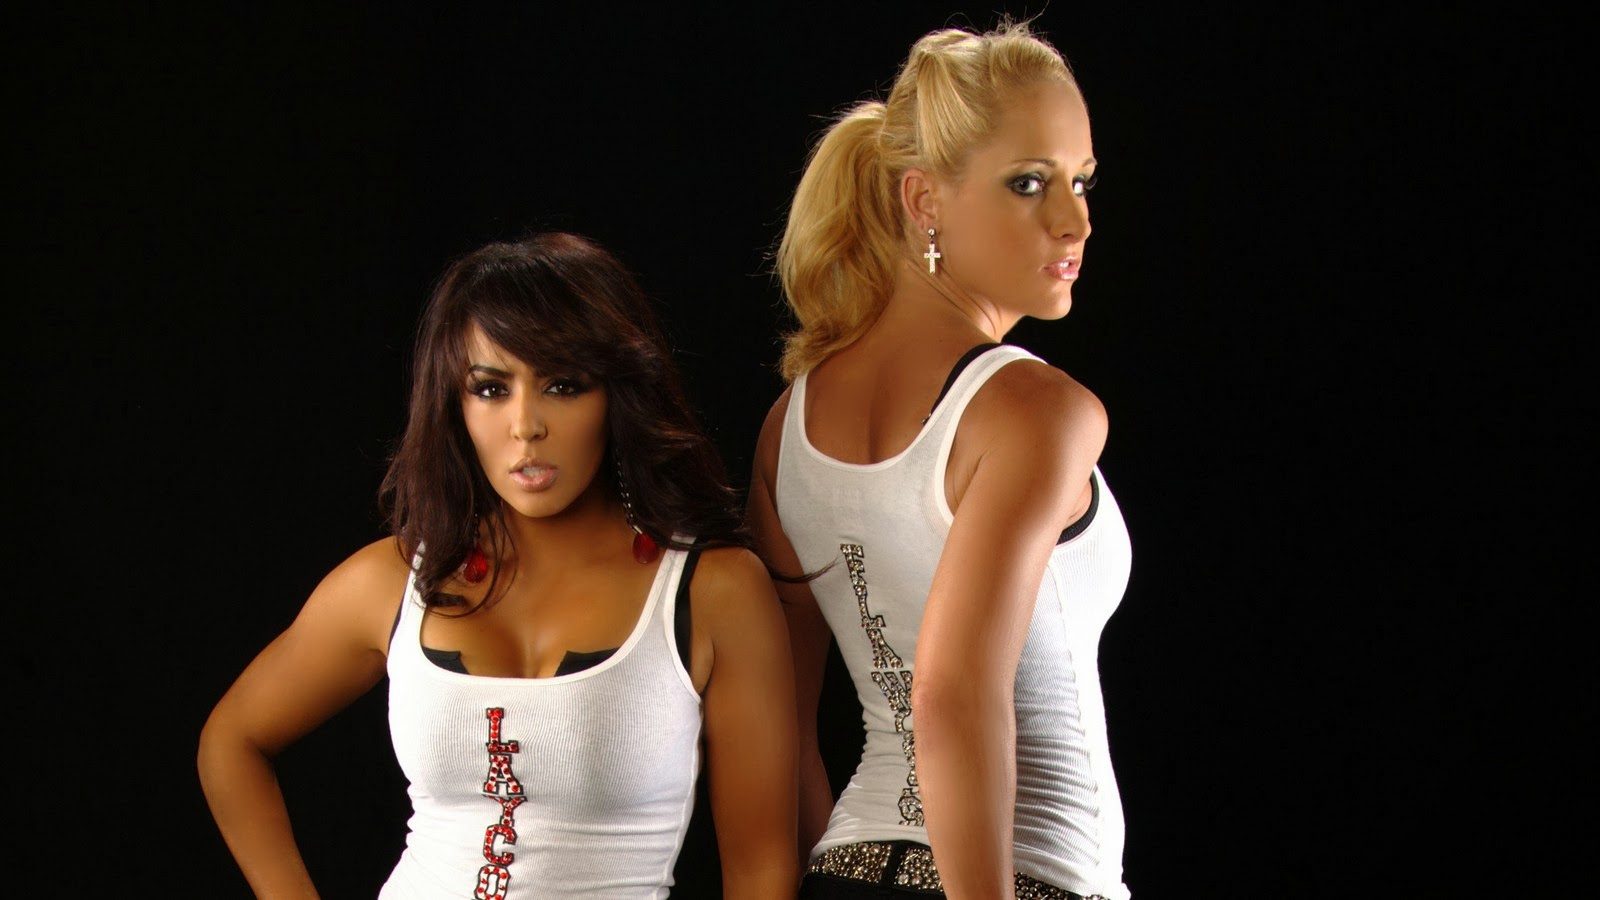 Hot Divas WWE HD Wallpaper   HD Wallpapers  High Quality